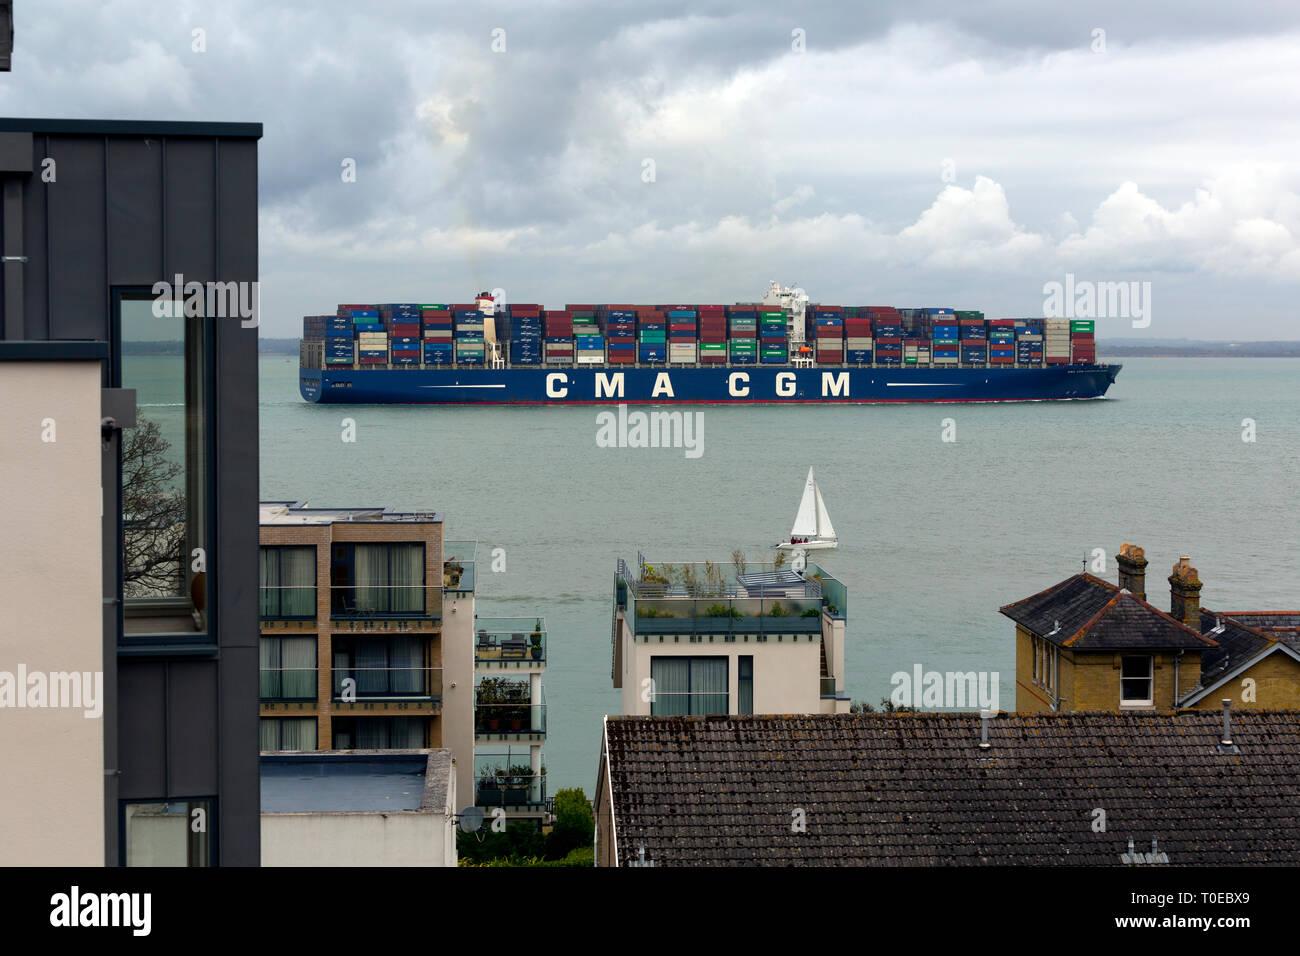 CMA, CGM, Vasco de Garma, Ship, The Solent, heading, Southampton, Container, Terminal, Cowes, Isle of Wight, Hampshire, England, UK, departing - Stock Image